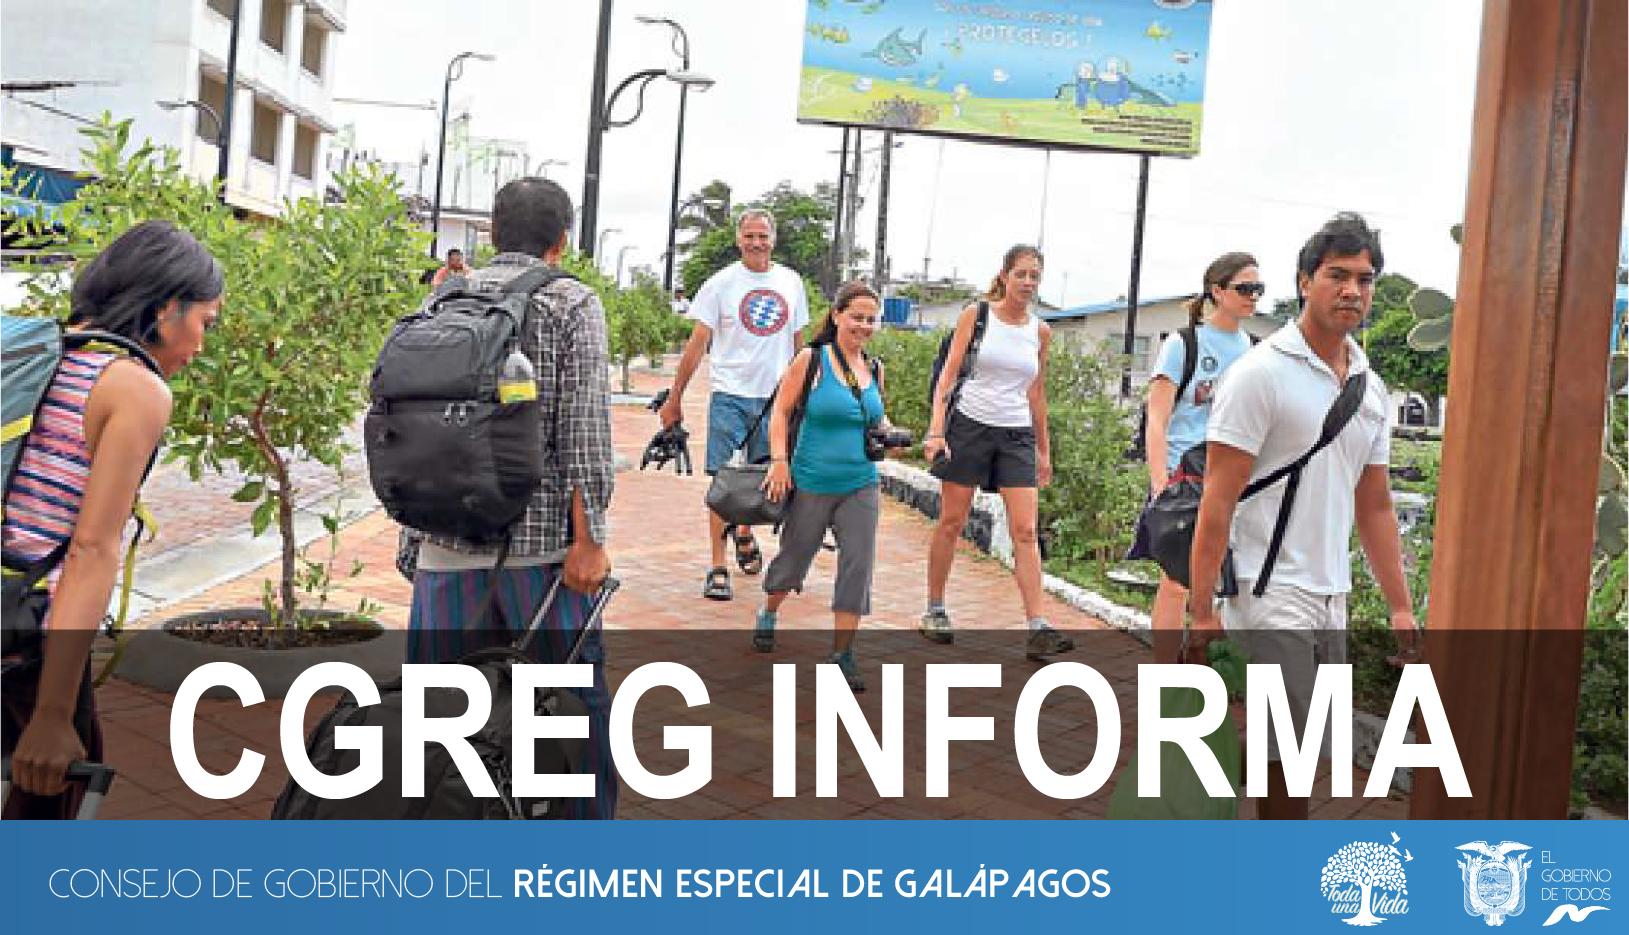 CGREG infoma3-01